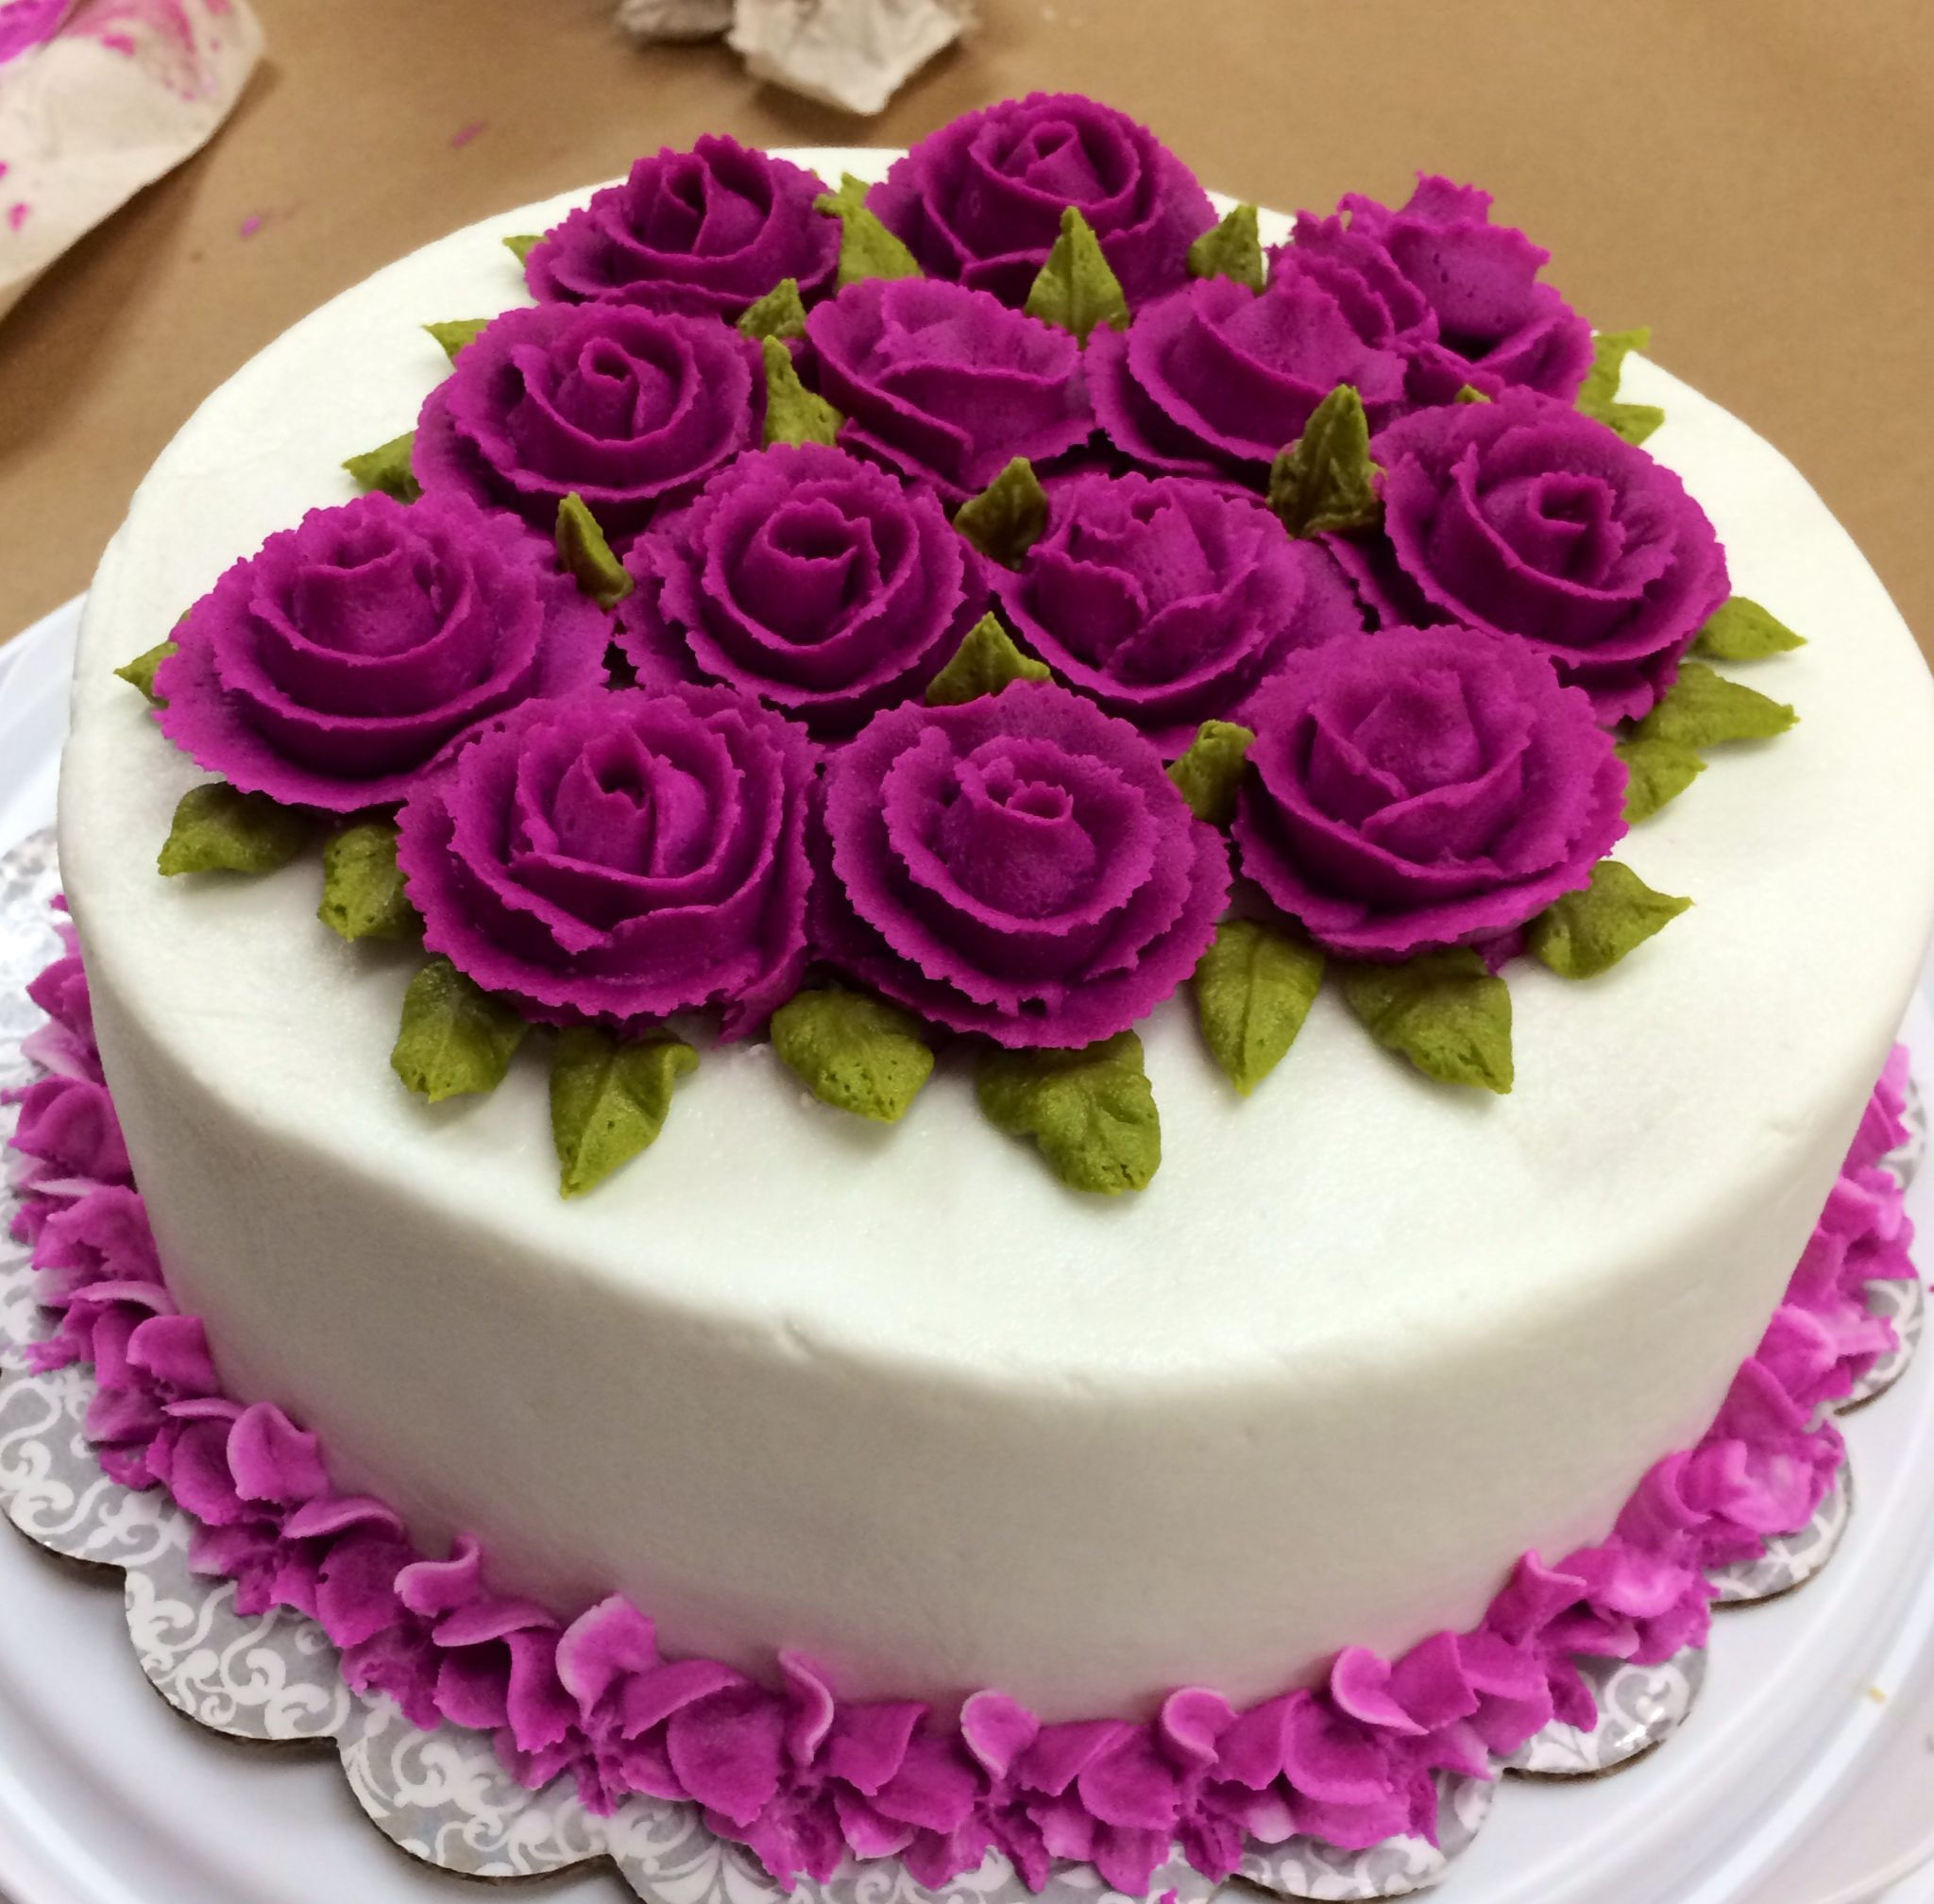 Result Decorating Cake Buttercream Banh Kem